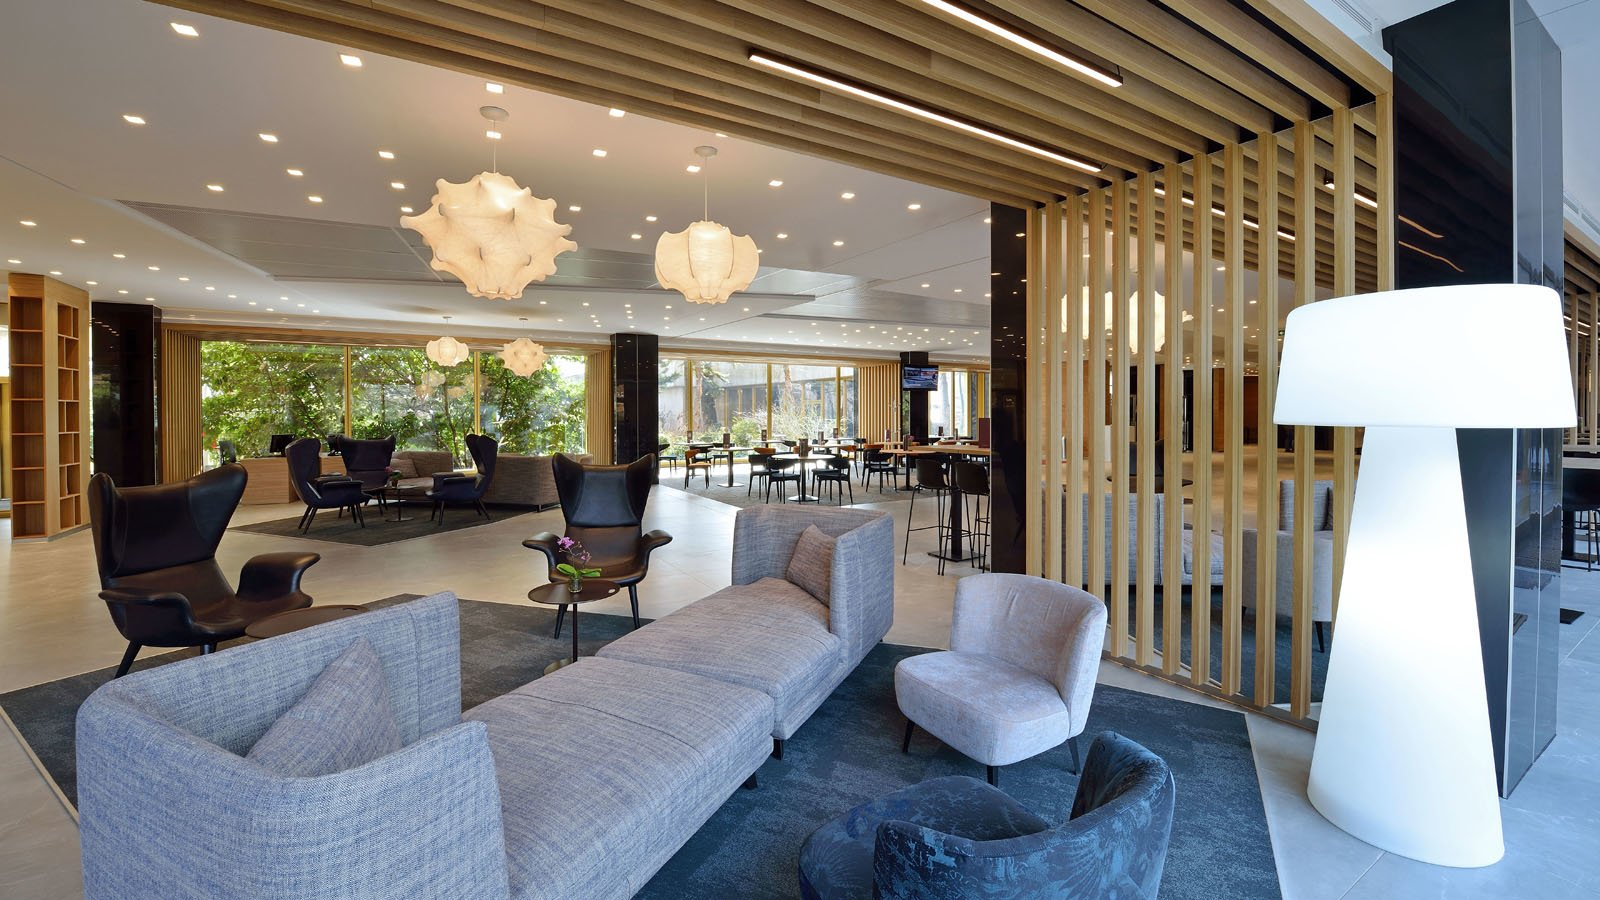 Foyer Hotel : Danubius health spa resort margitsziget**** budapest